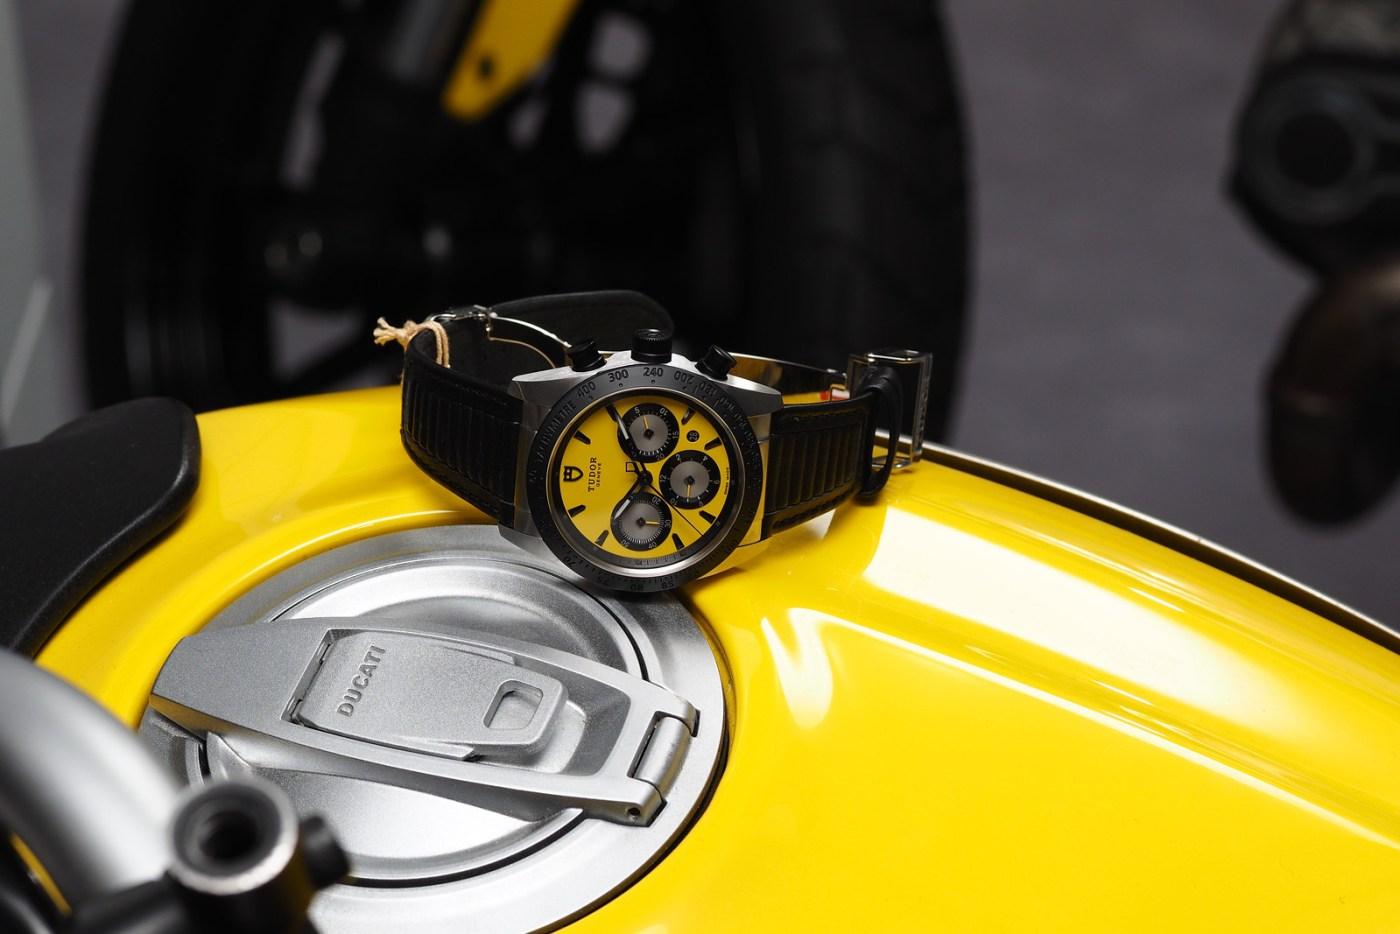 Tudor Fastrider Chrono on Ducati